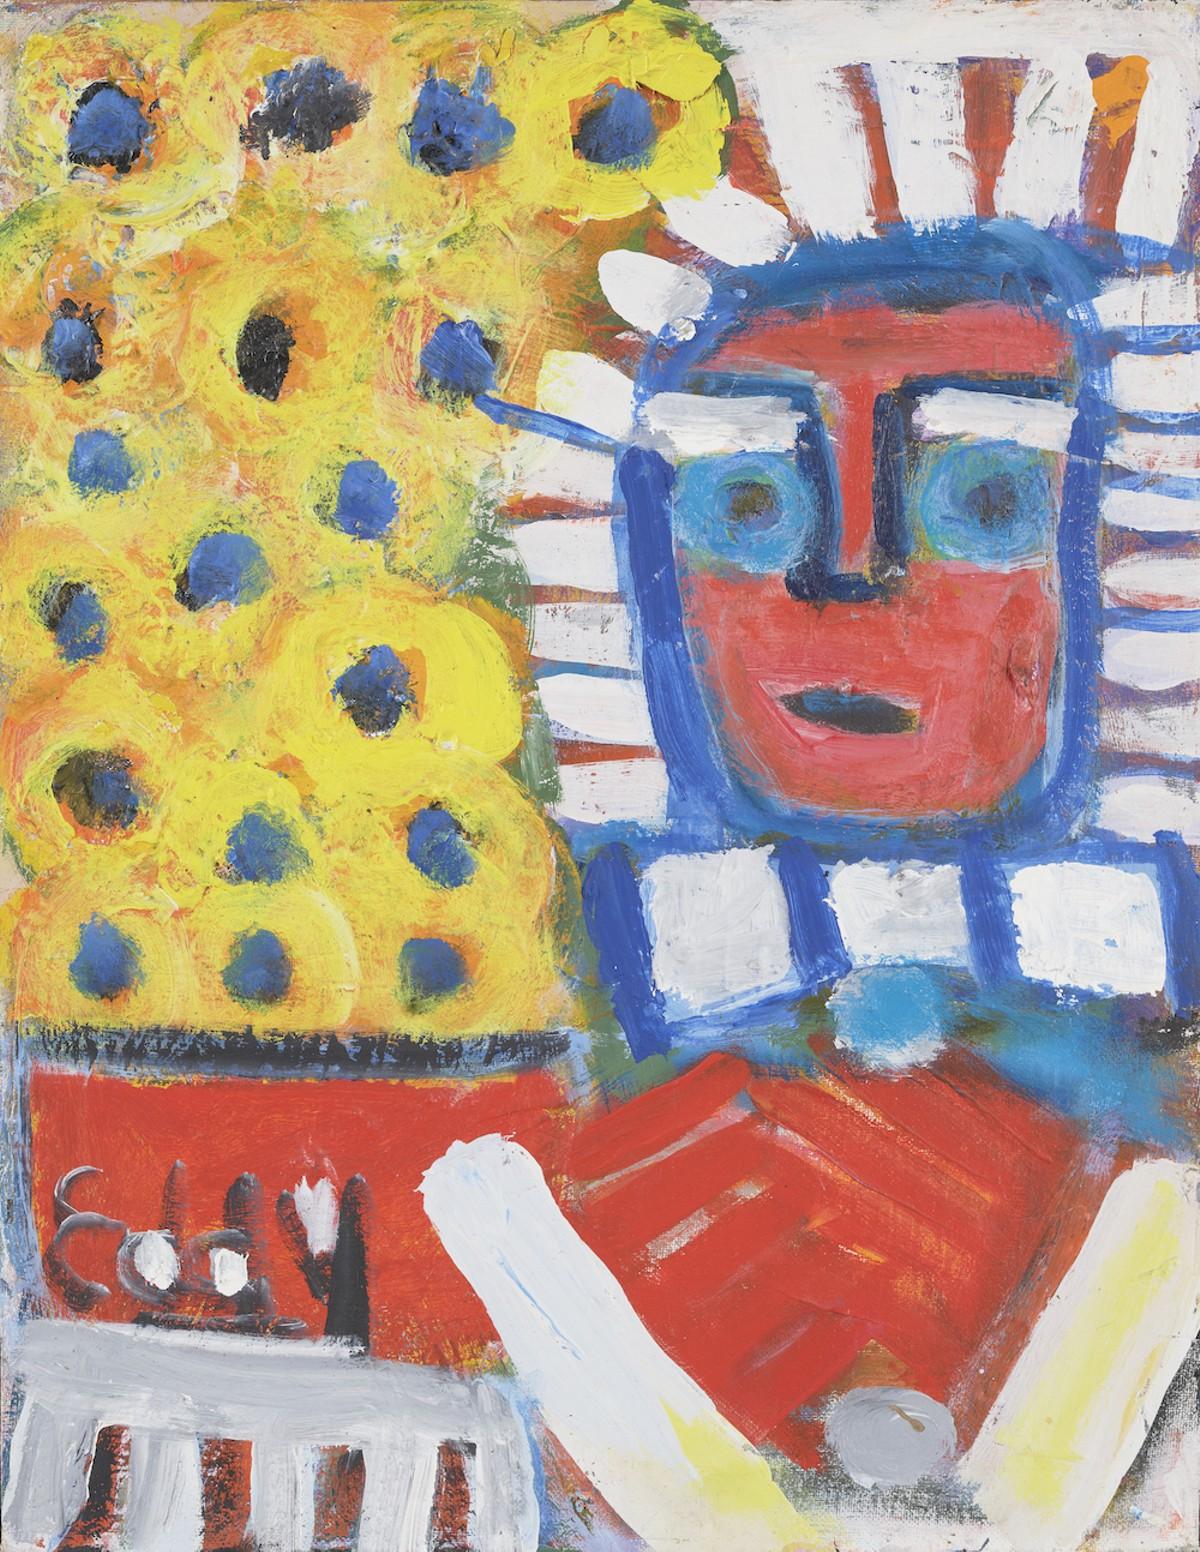 Mr. Eddy Mumma (American, 1908—1986), 'Untitled (Statue of Liberty after Van Gogh's Sunflowers),' n.d. Acrylic on canvas board. Collection of the Mennello Museum of American Art, Gift of Josh Feldstein, 2015-001-002. © Josh Feldstein